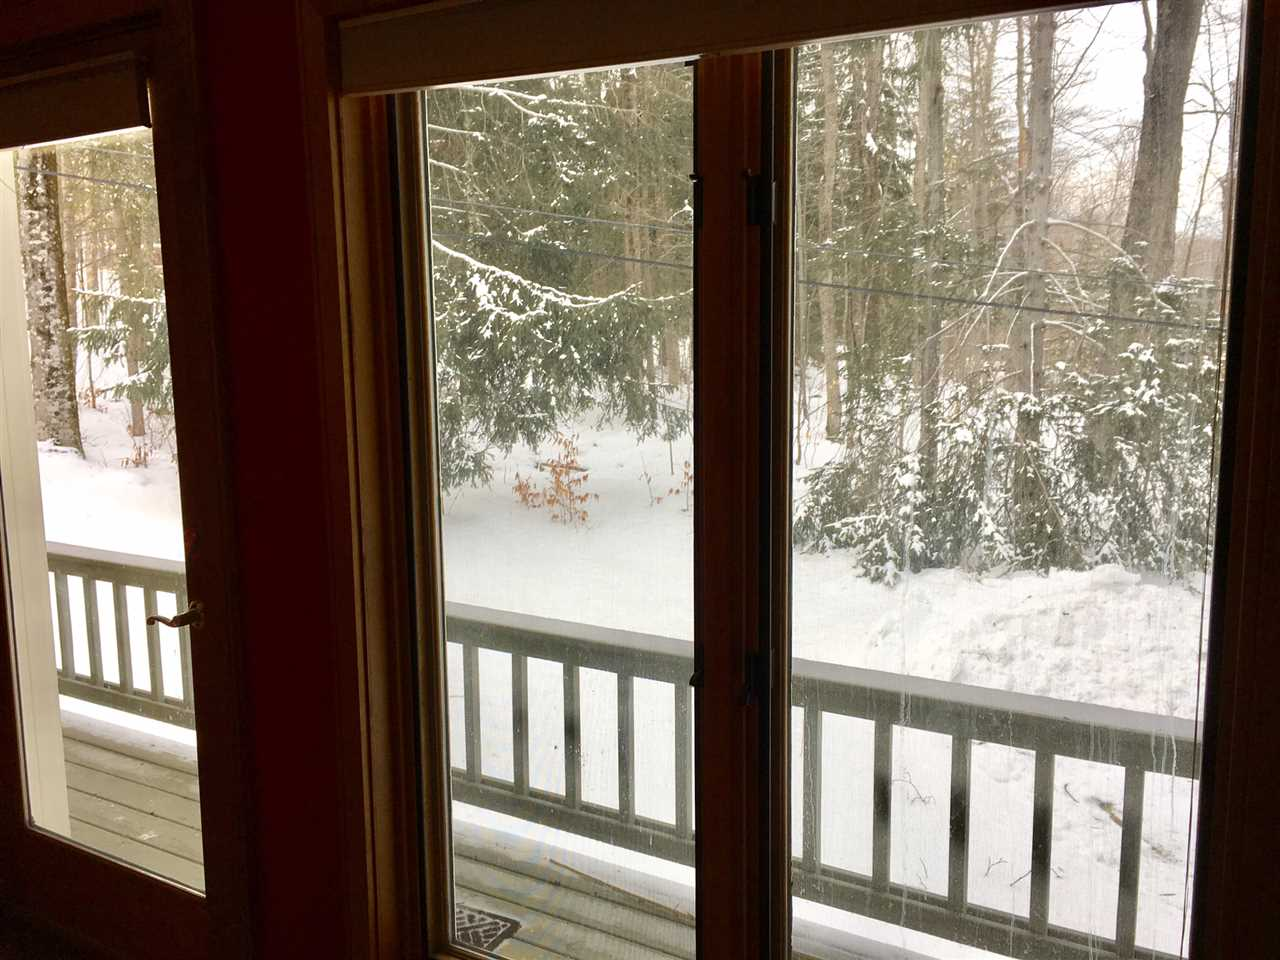 Mount-Snow-Real-Estate-4614113-14